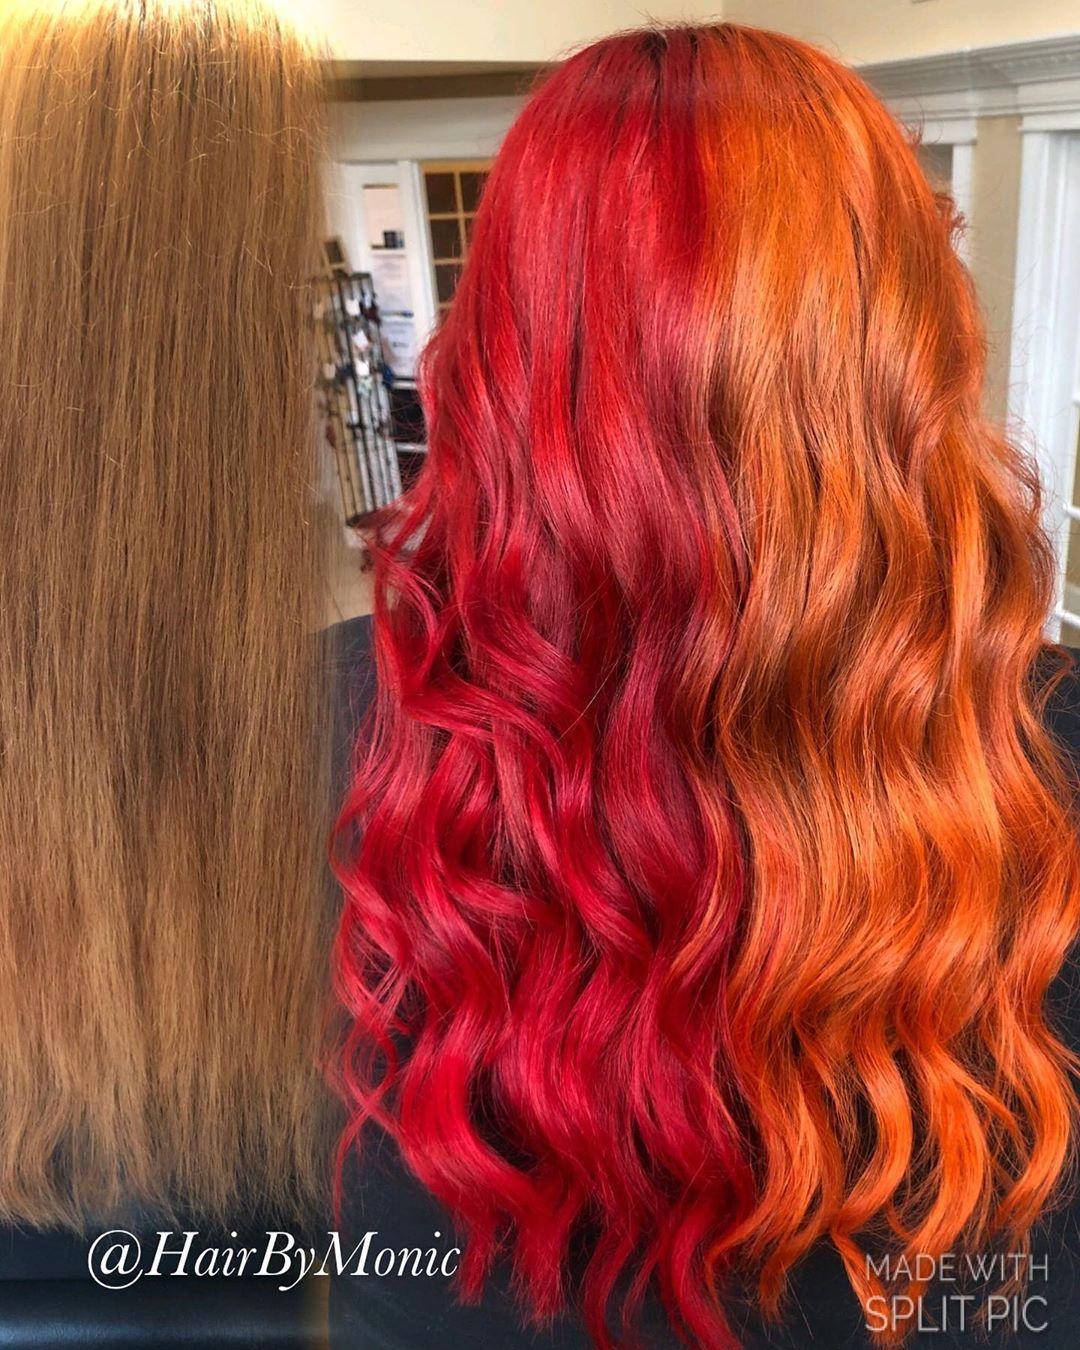 hair.by .monic 118236536 344578270049685 1115326378897897751 n - Cores de Cabelo 2021 – Principais Tendências